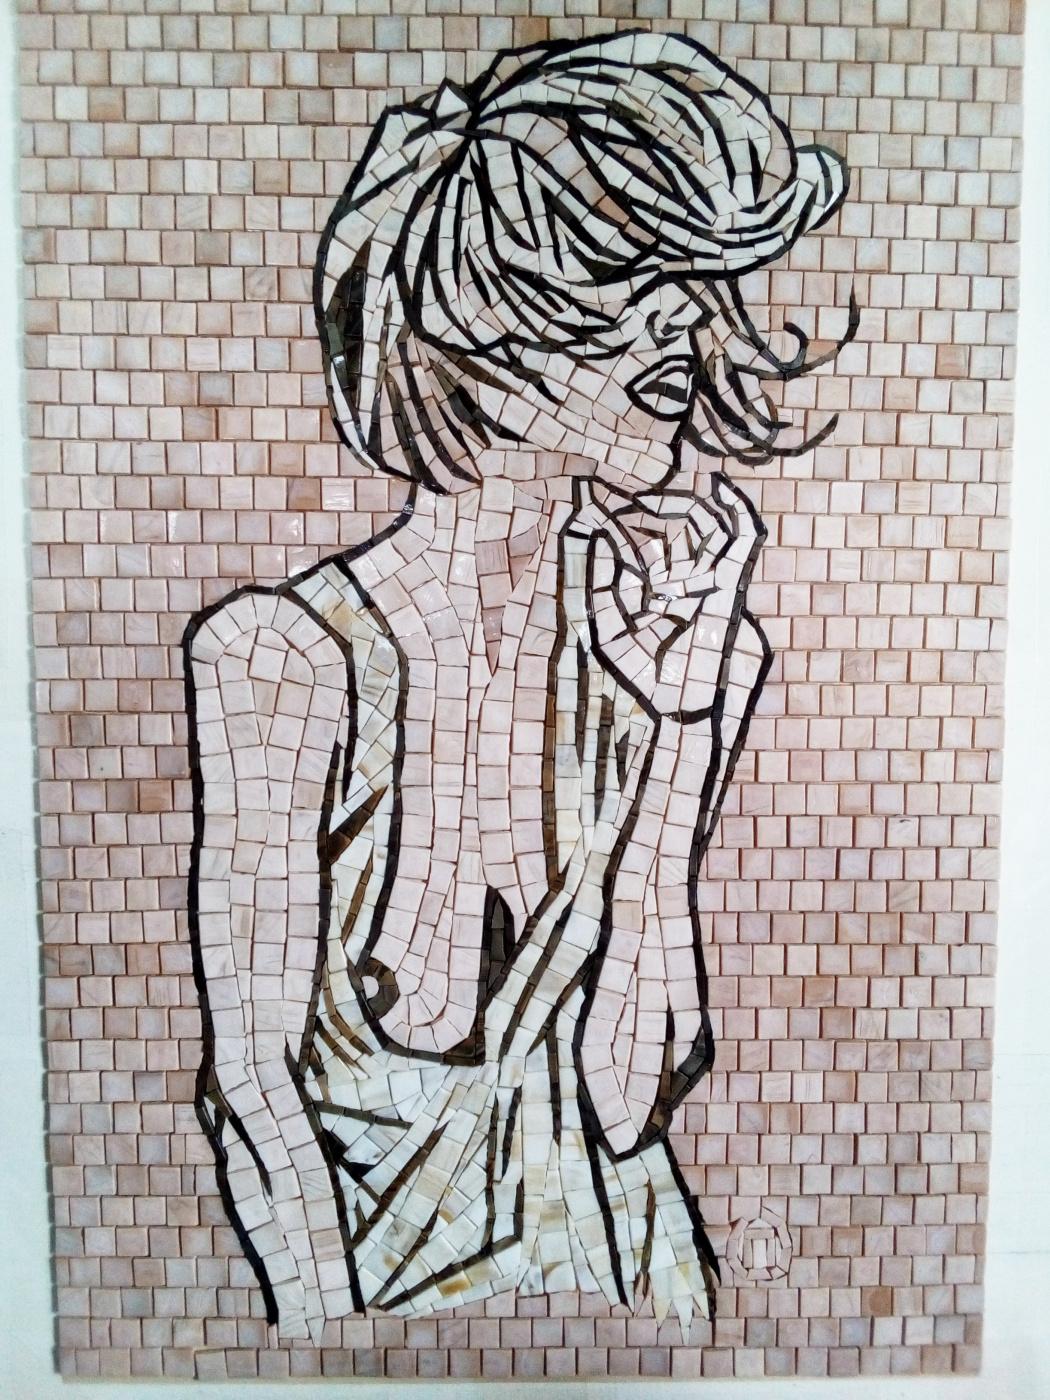 Olesya Vyacheslavovna Pisarenko. Windy. Mosaic